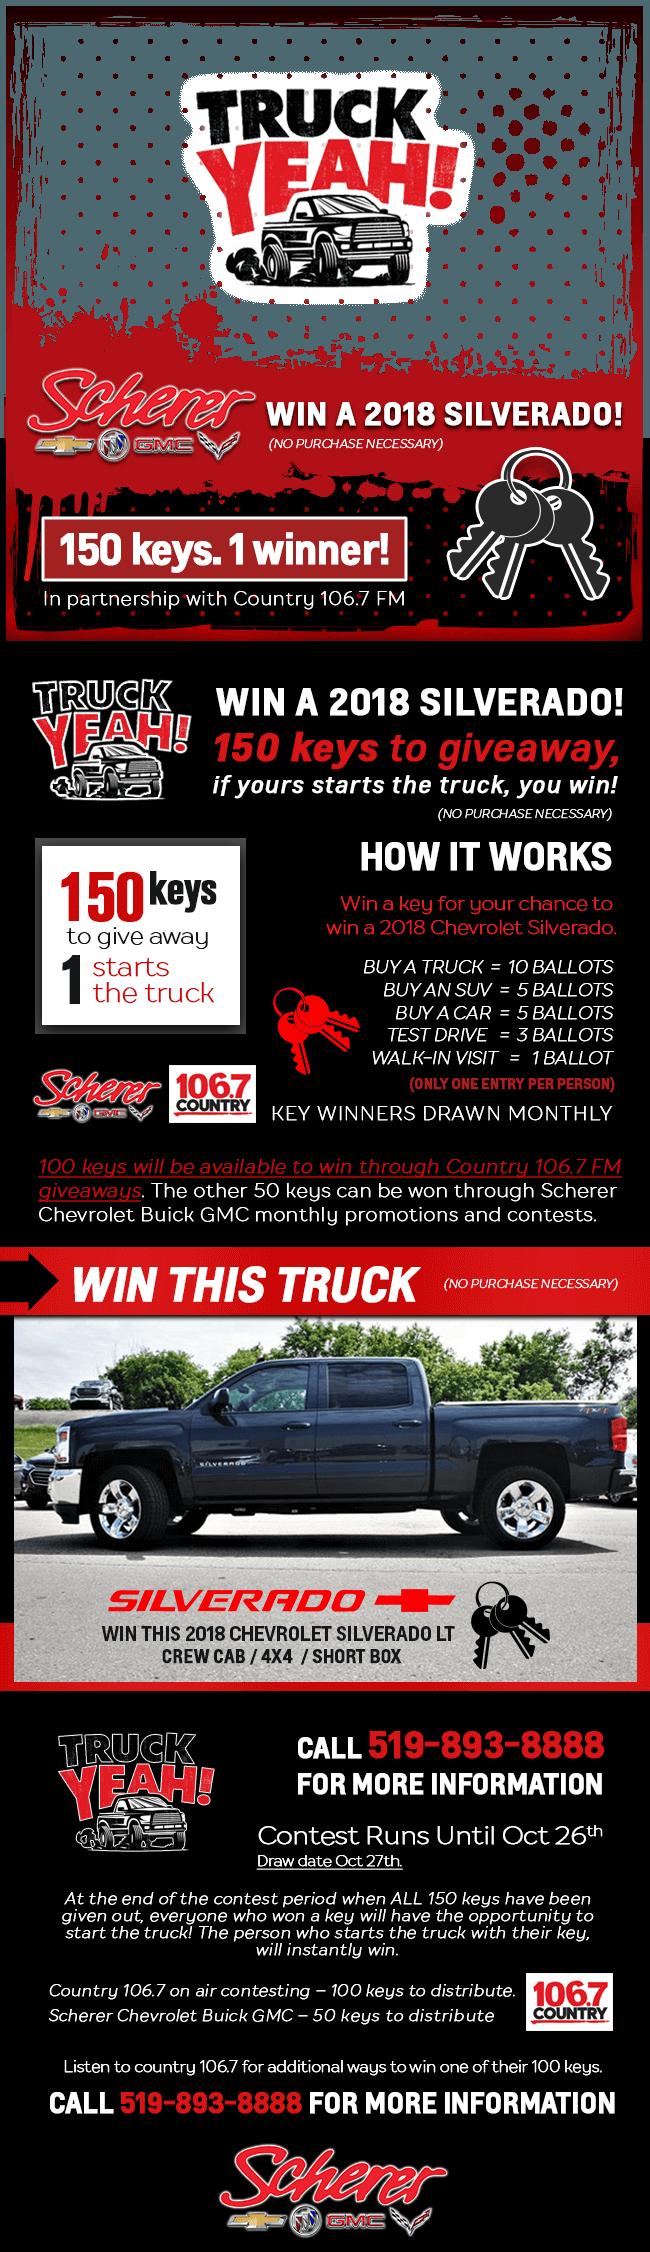 Truck Yeah Contest Details